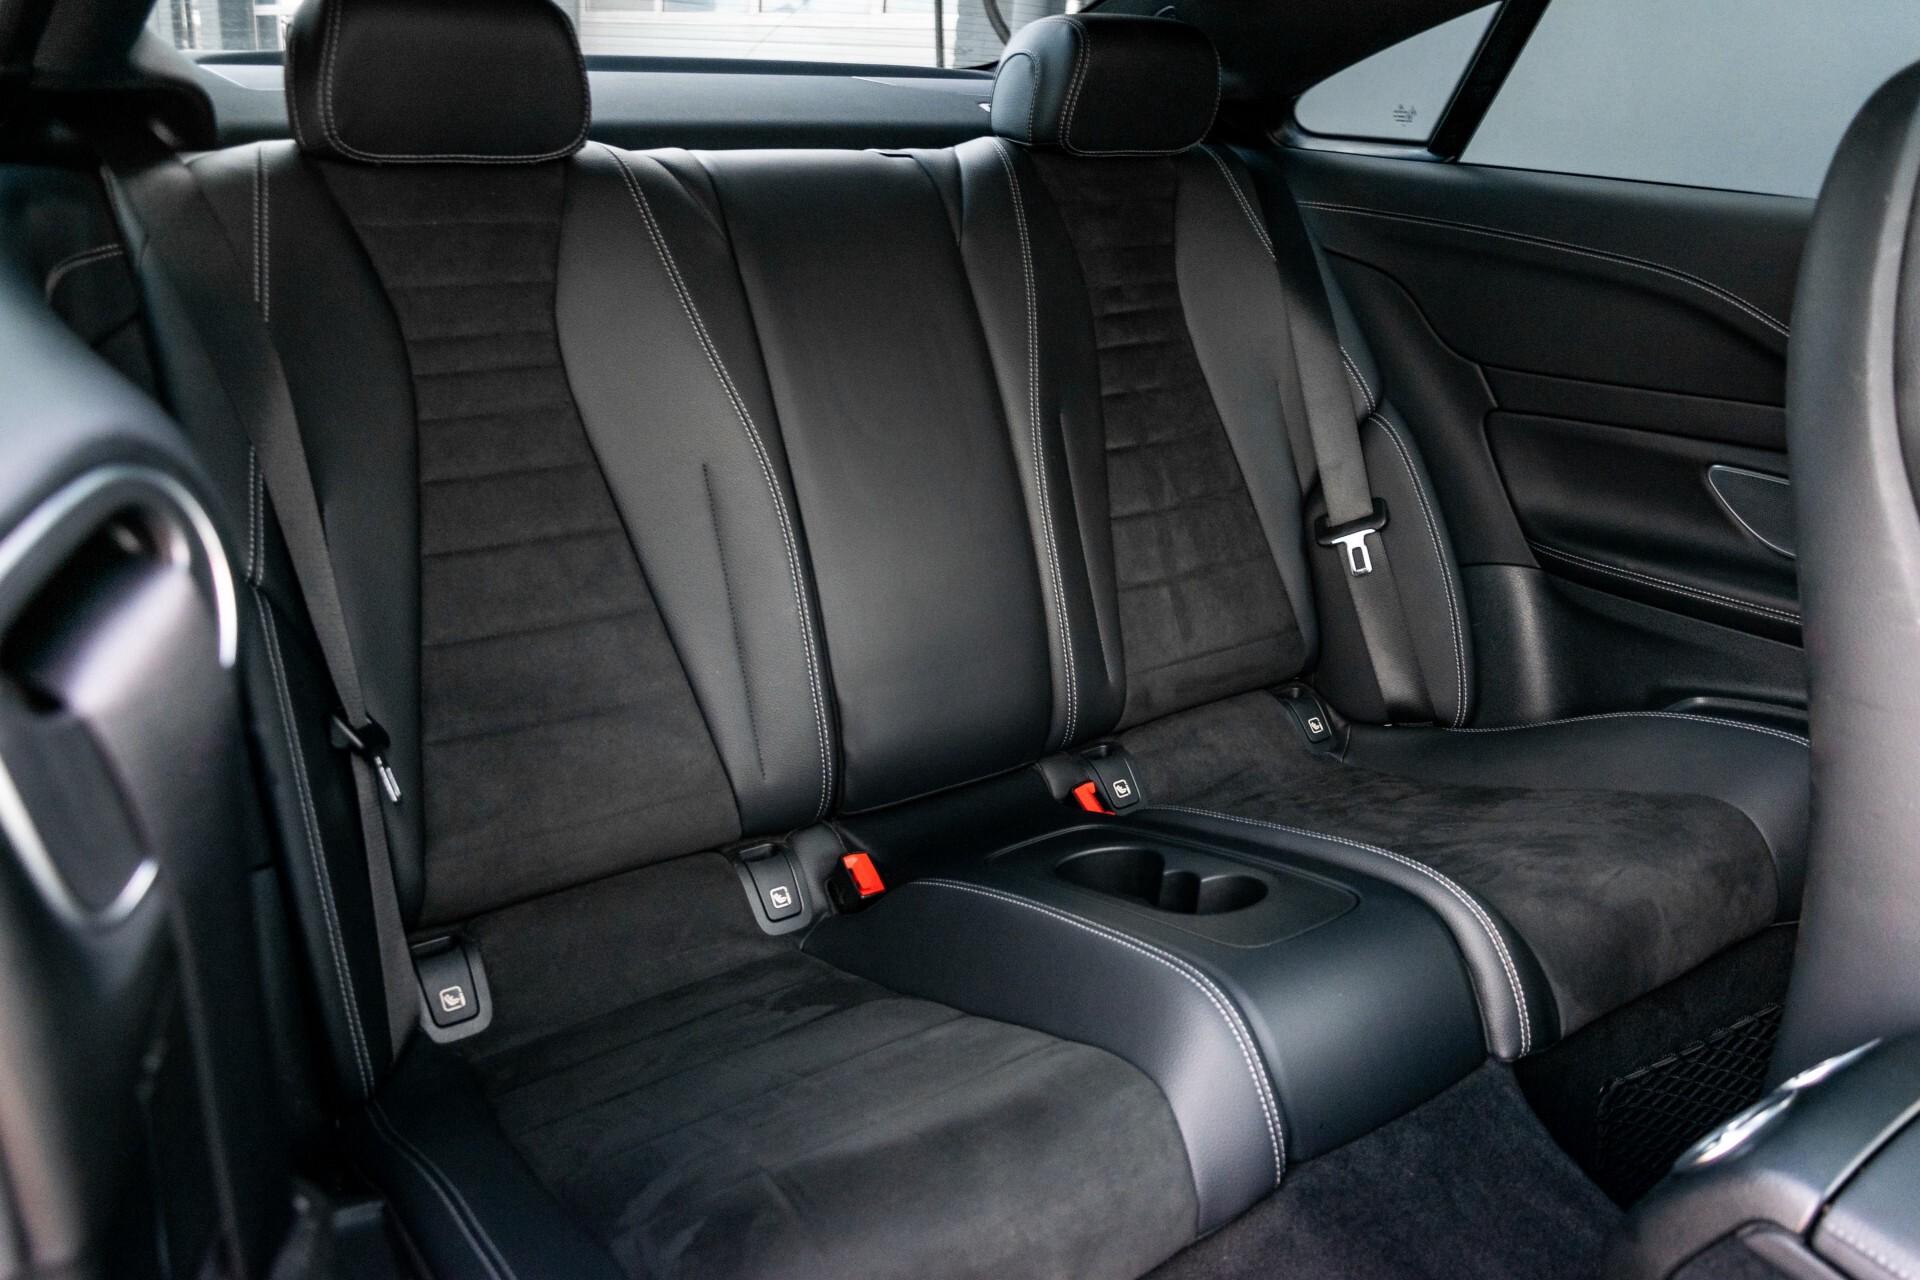 Mercedes-Benz E-Klasse Coupé 300 AMG Panorama/Rij-assist/Keyless/Massage/Memory/HUD/Standkachel/Night Aut9 Foto 8